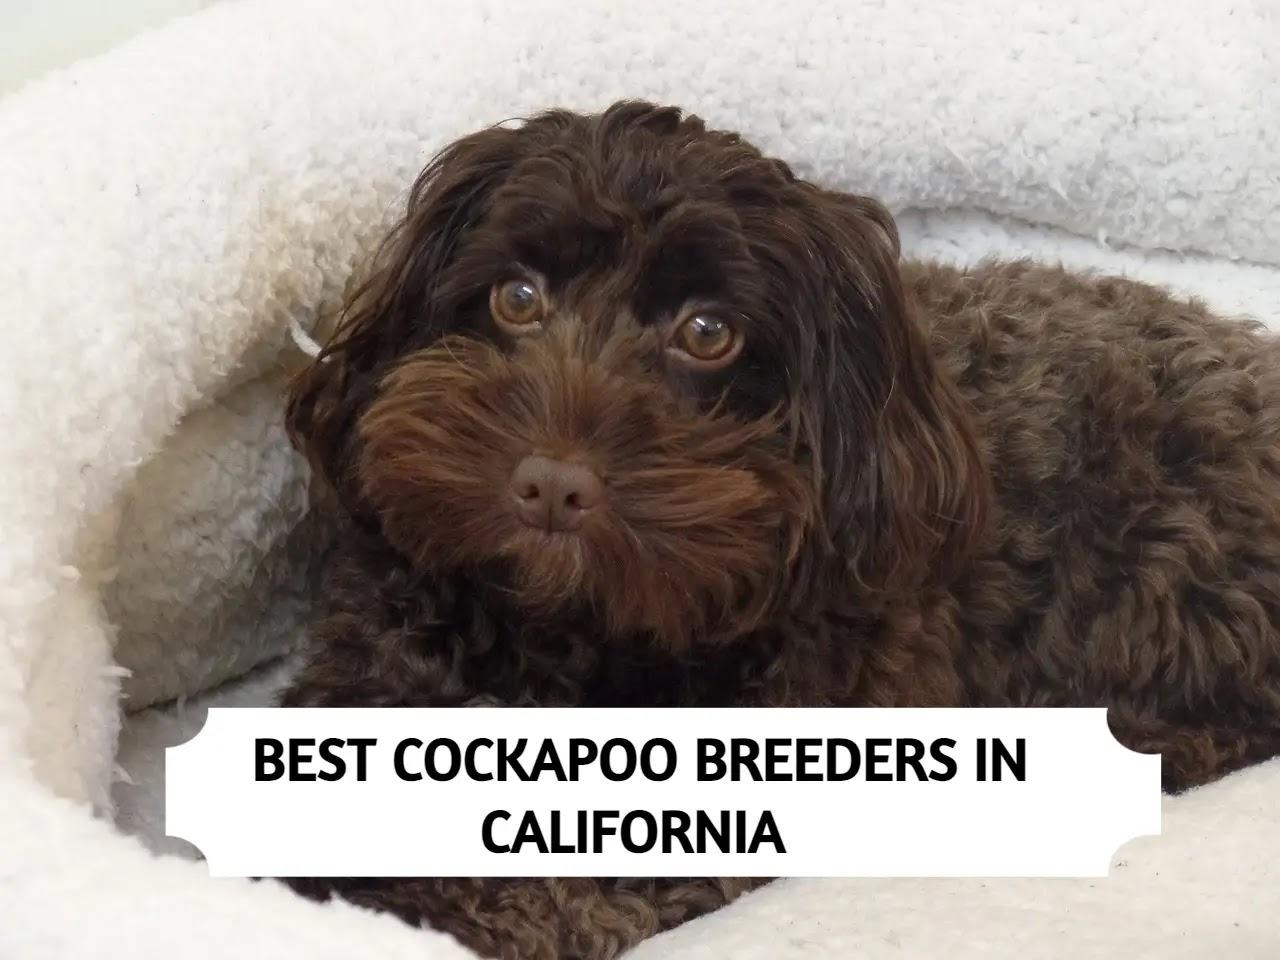 Best Cockapoo Breeders in California